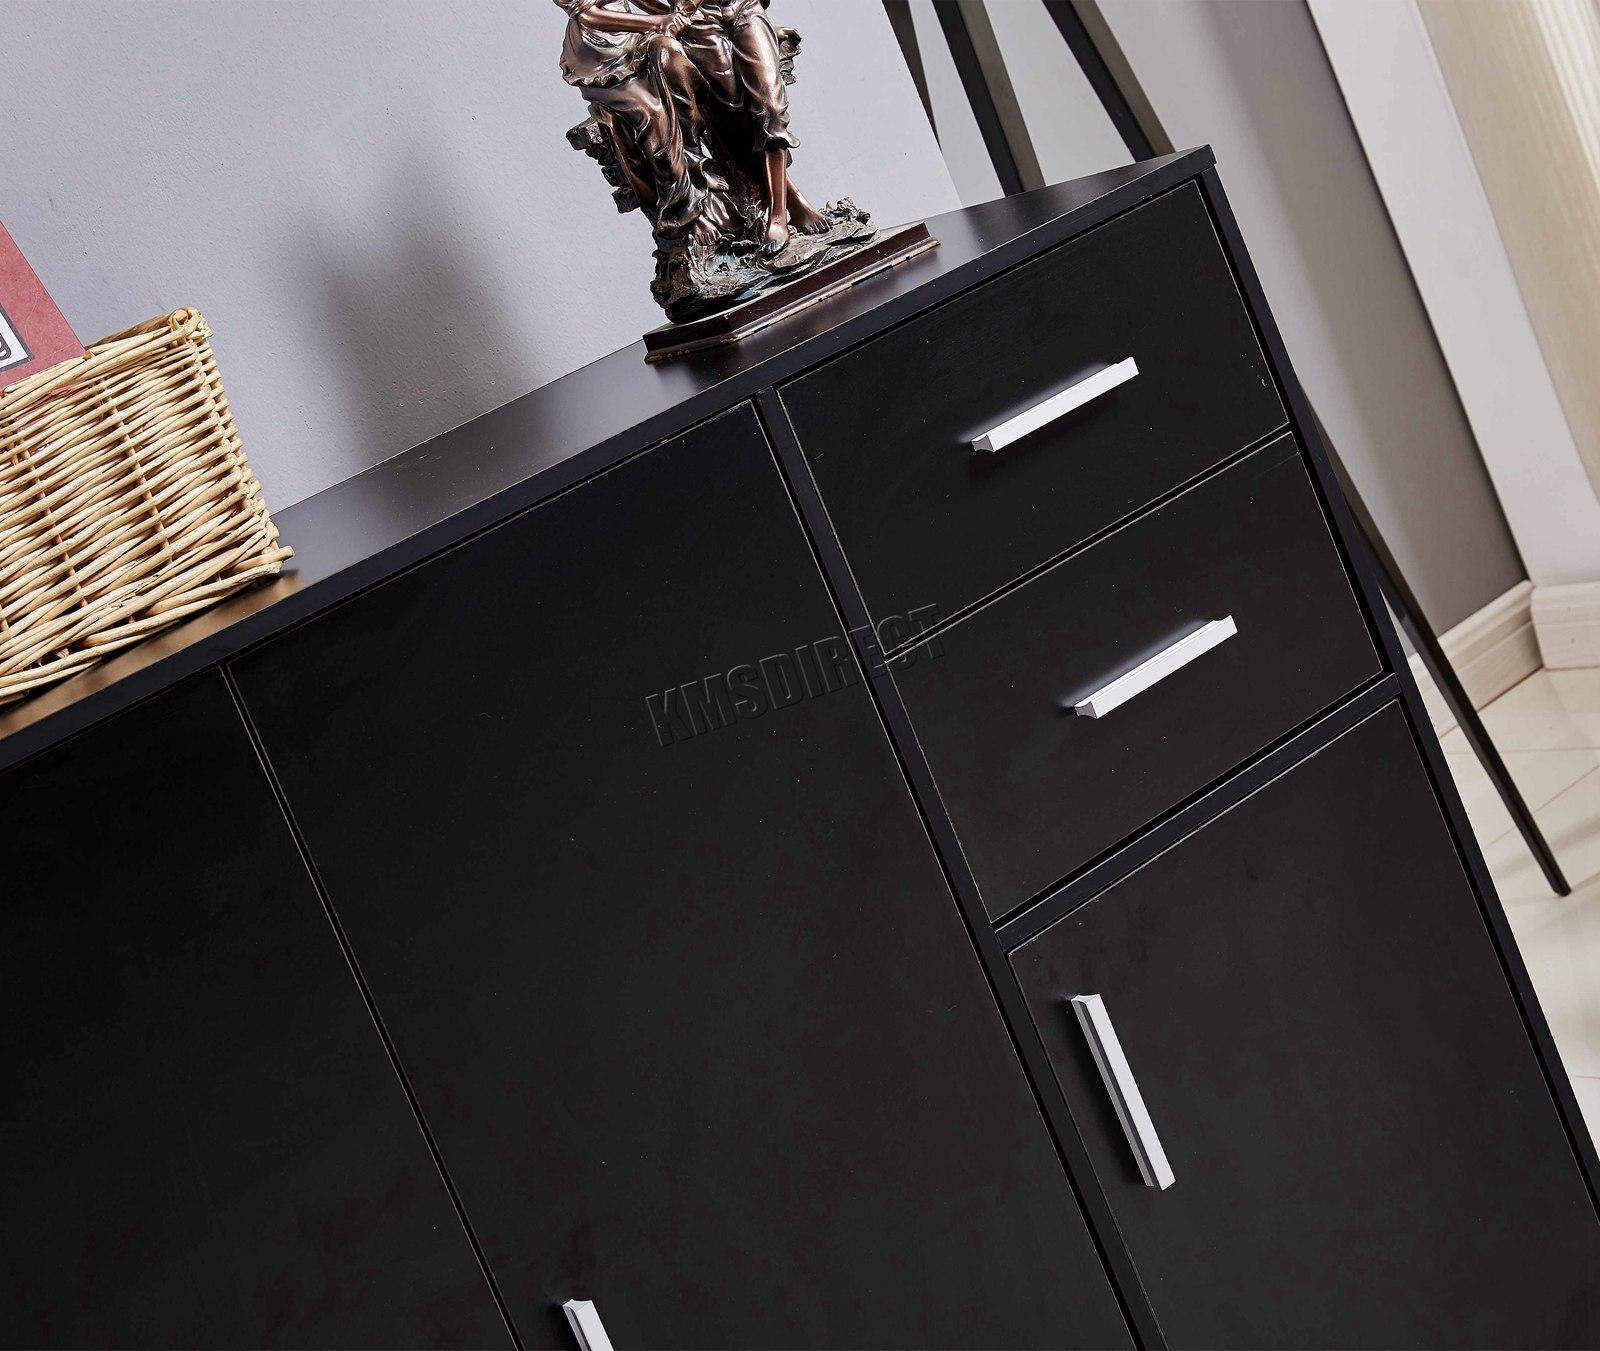 WestWood-Sideboard-Cabinet-Storage-tableware-Kitchen-Cupboard-Unit-PB-SSP01-NEW thumbnail 28